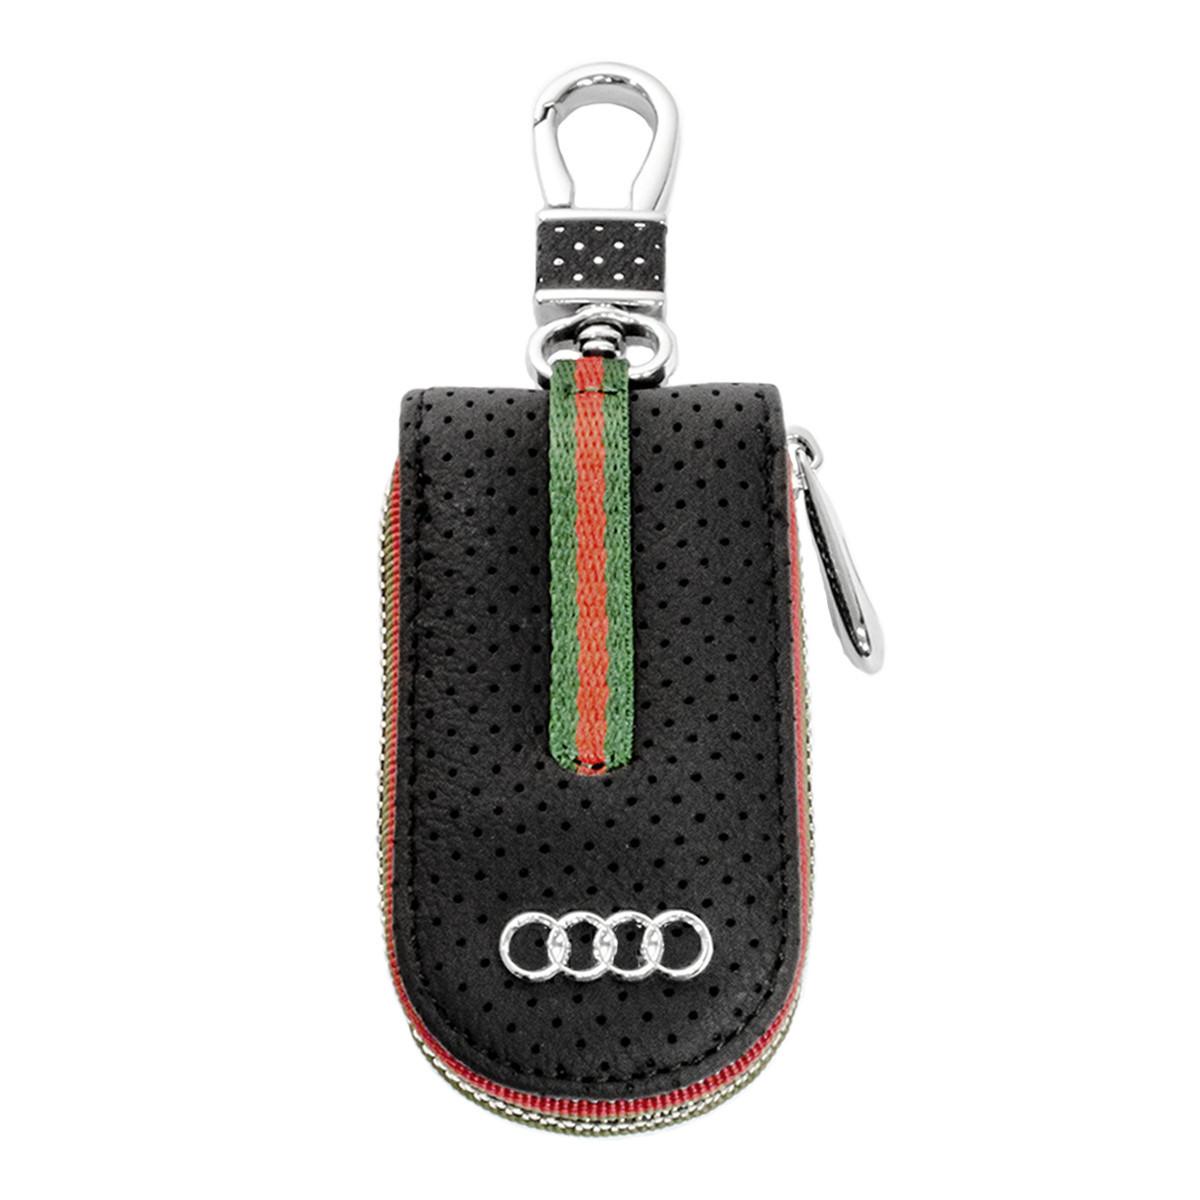 Ключница Carss с логотипом AUDI 01007 черная